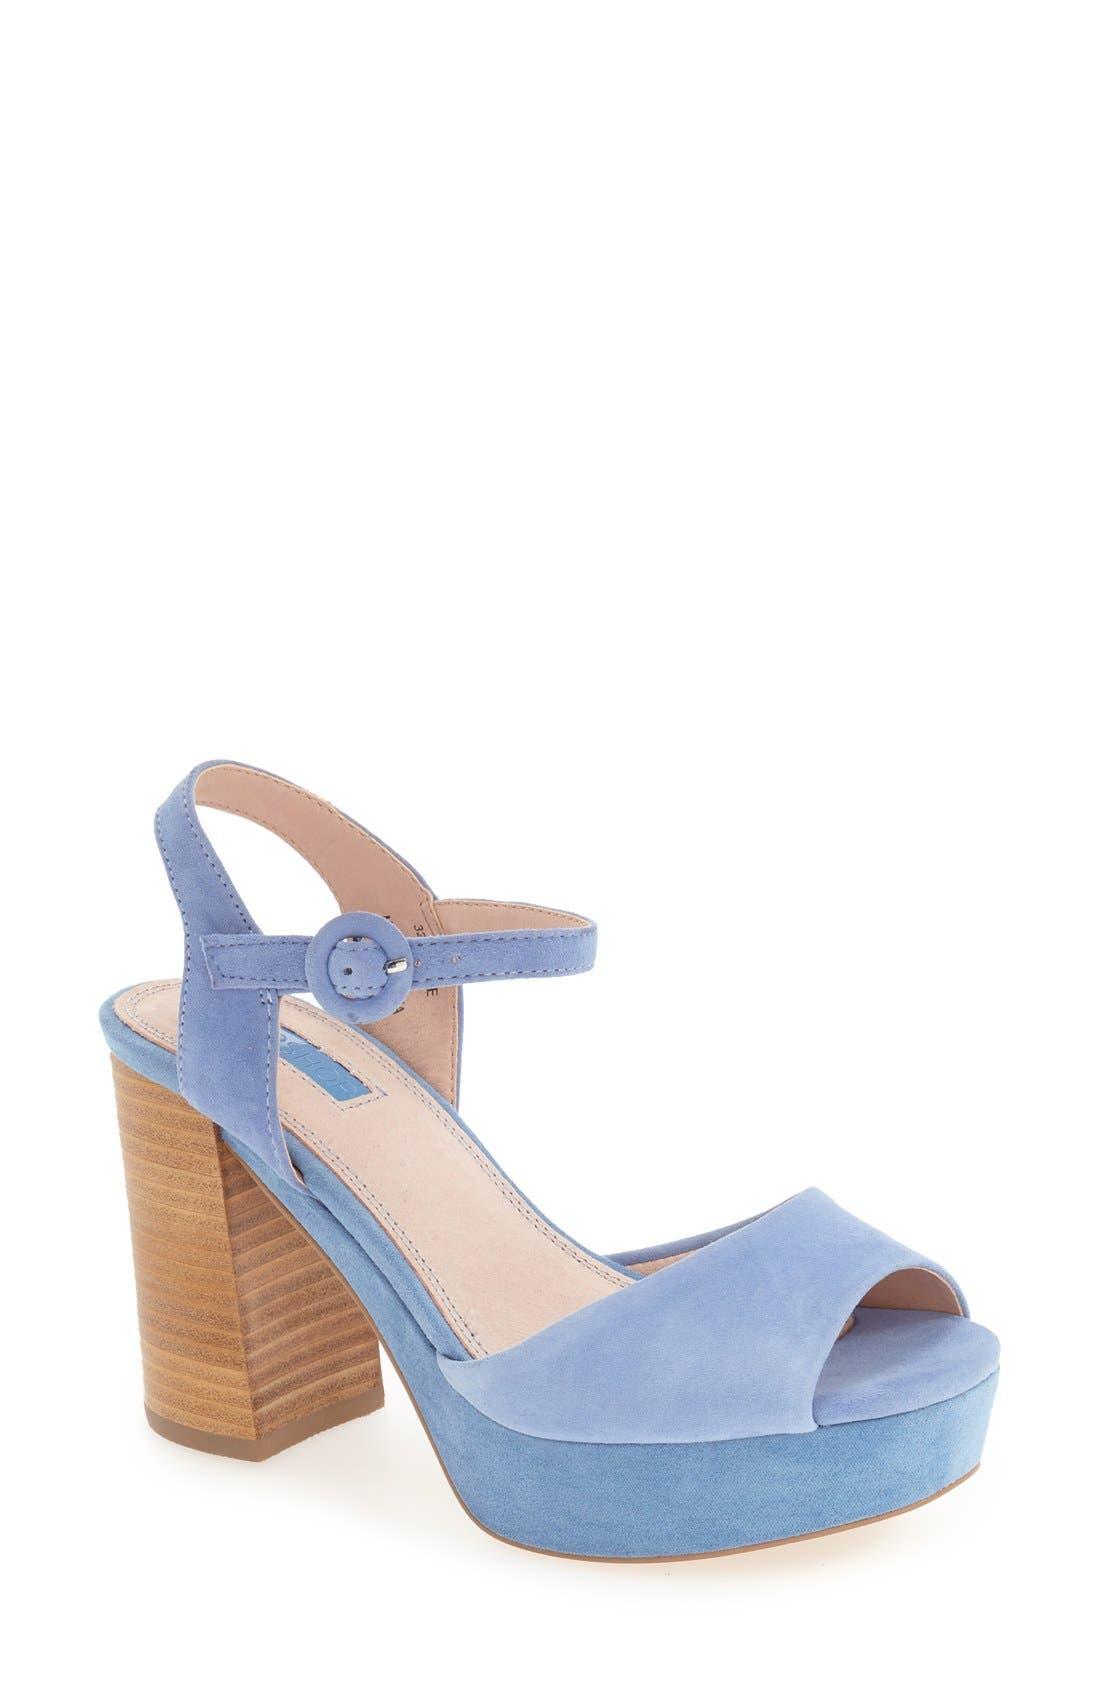 'Lana' Chunky Platform Sandal,                         Main,                         color, Blue